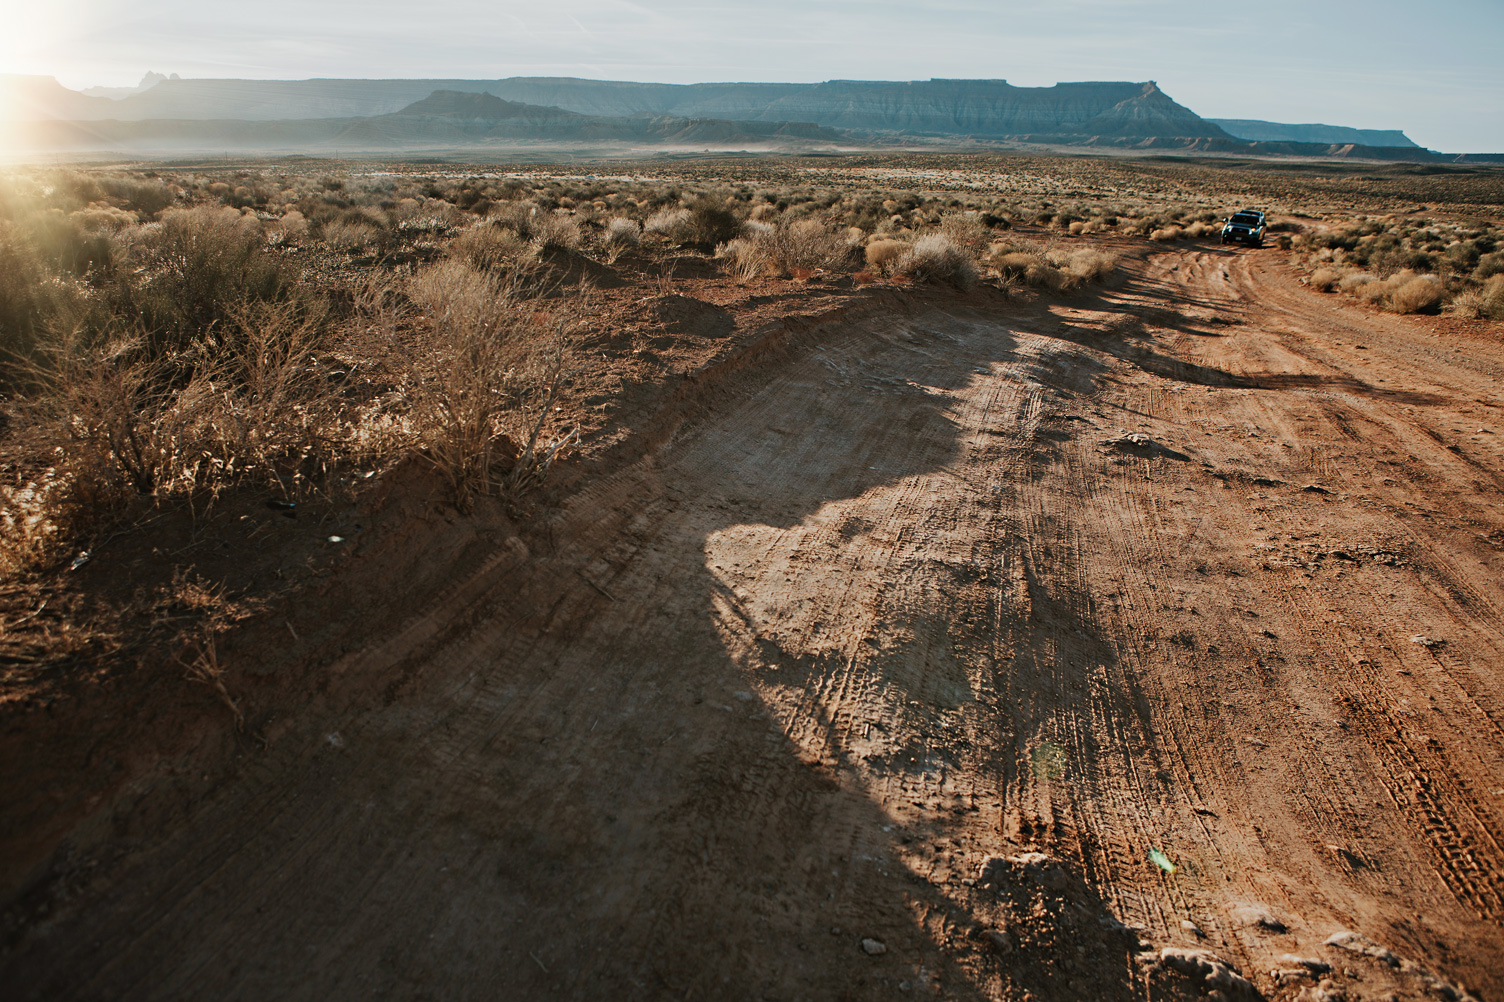 CindyGiovagnoli_Utah_Zion_desert_night_morning_coffee_blm_land_off_grid-013.jpg